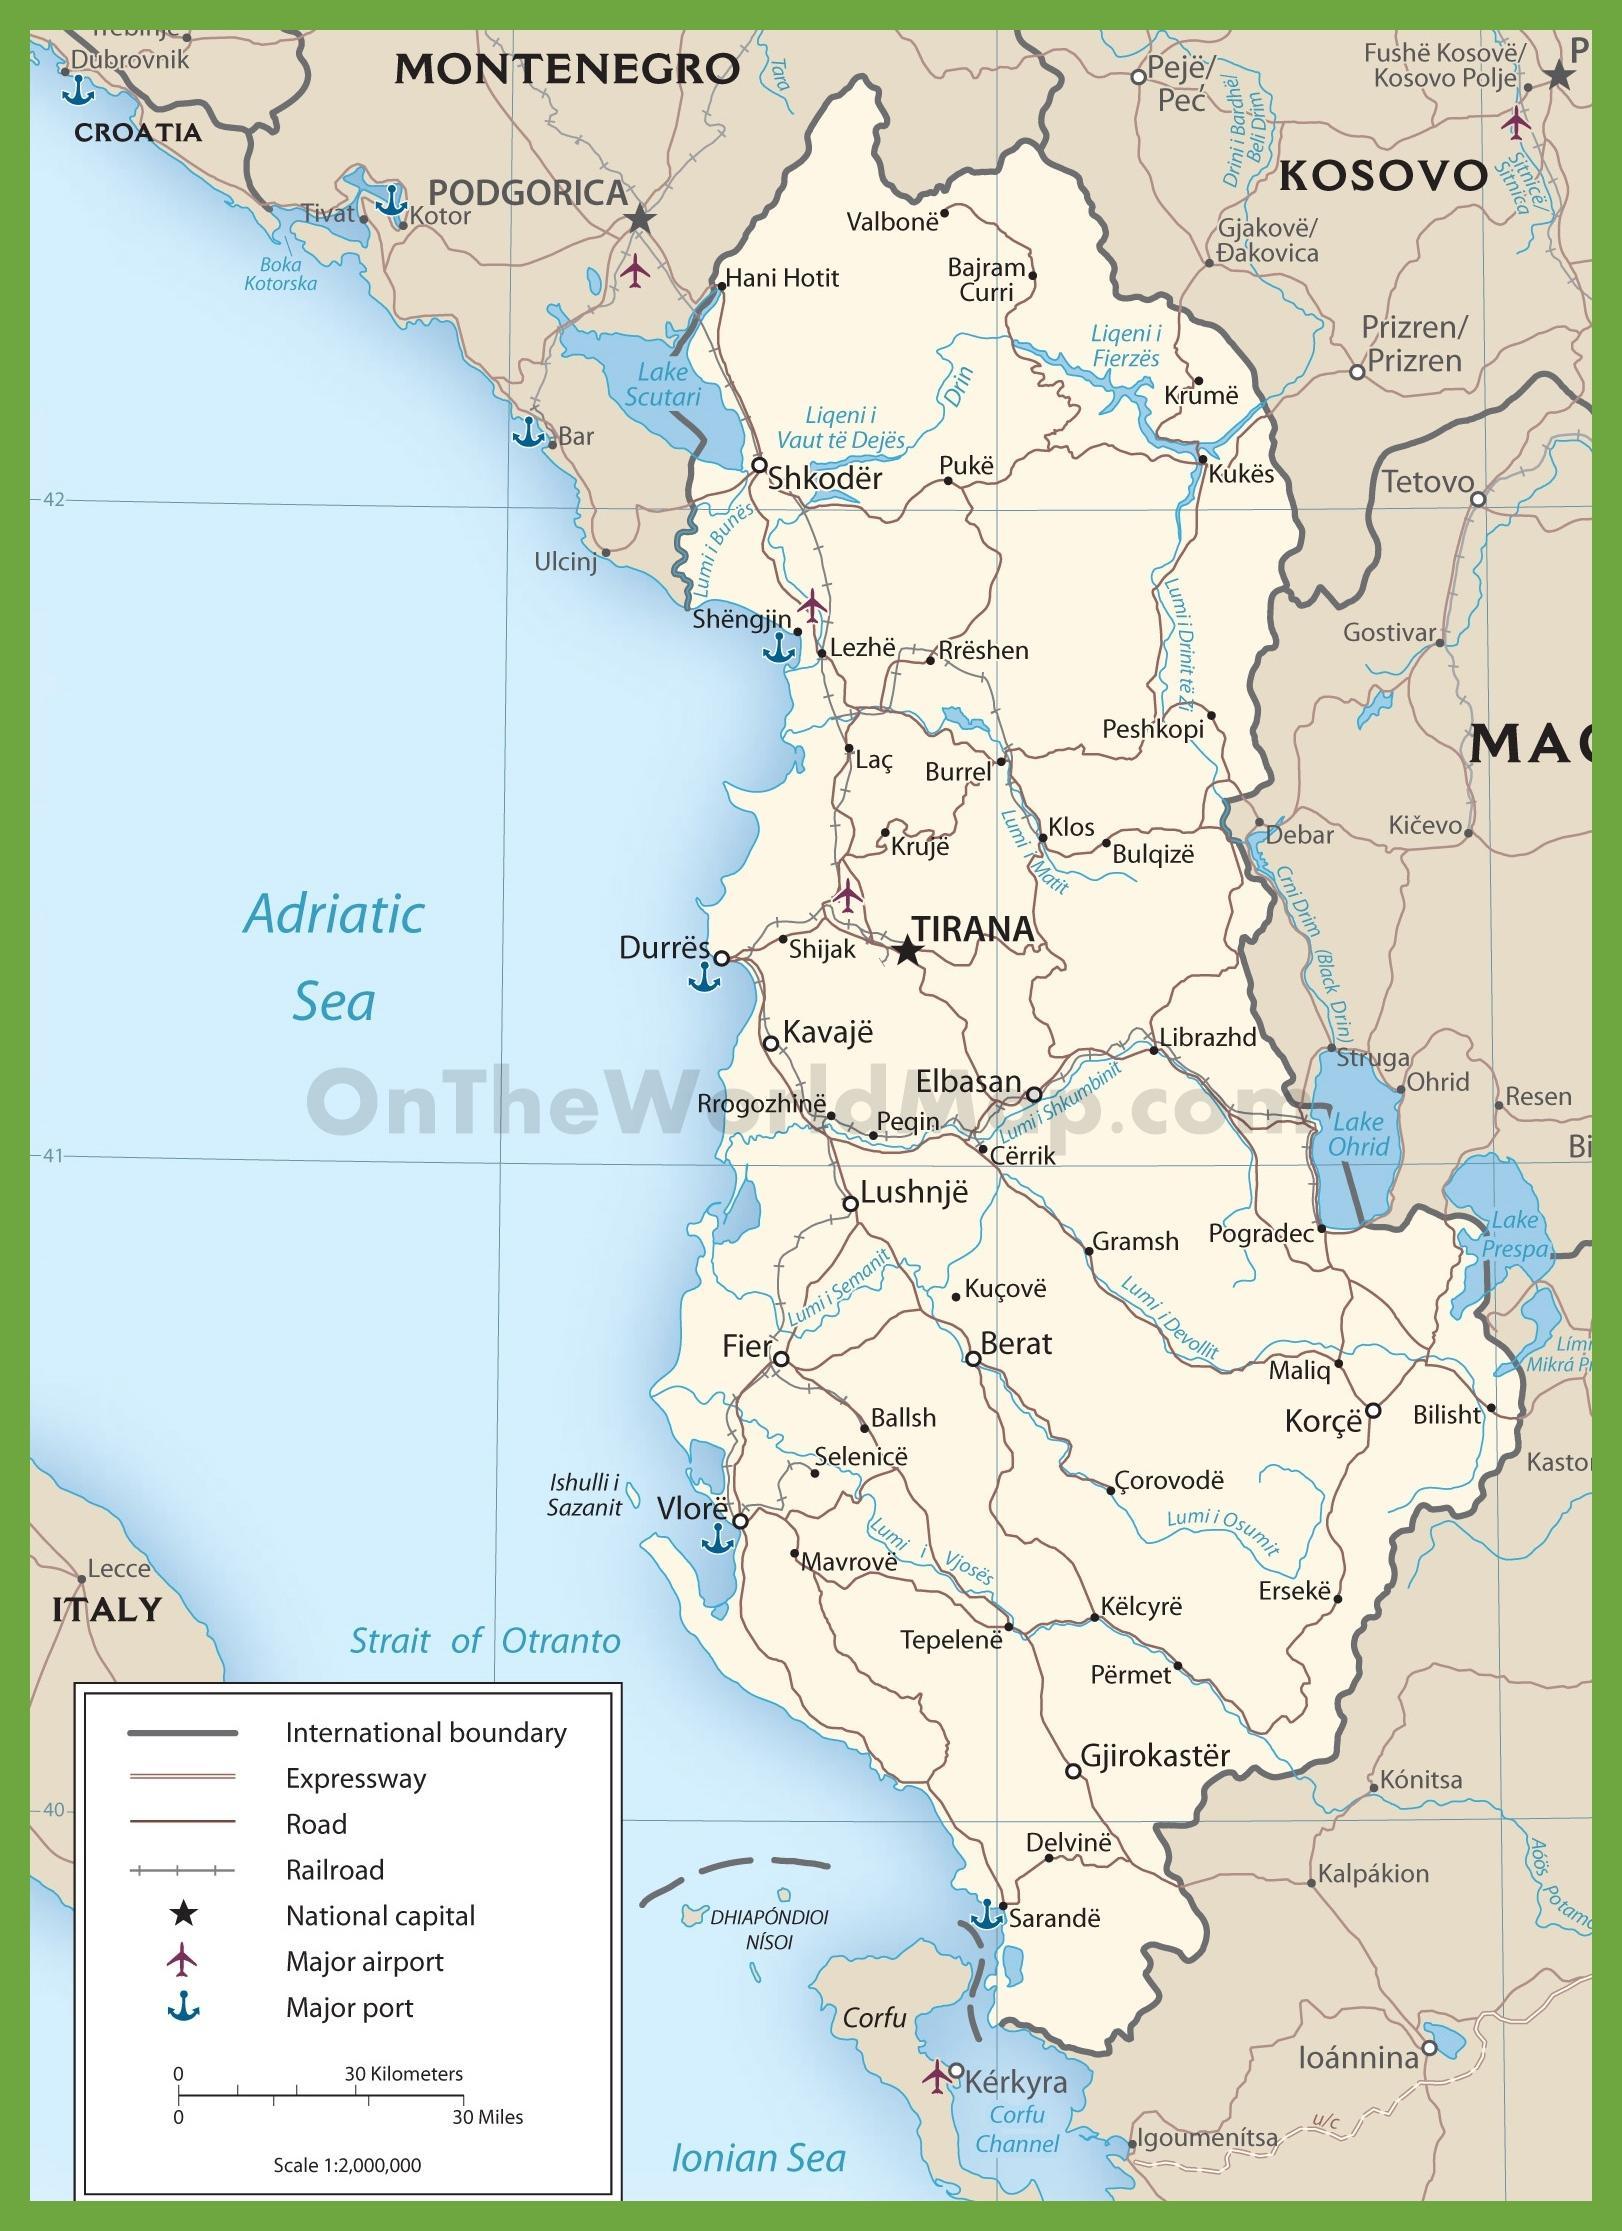 Albania Cartina Stradale.Albania Mappa Stradale Albania Mappa Delle Strade Europa Del Sud Europa